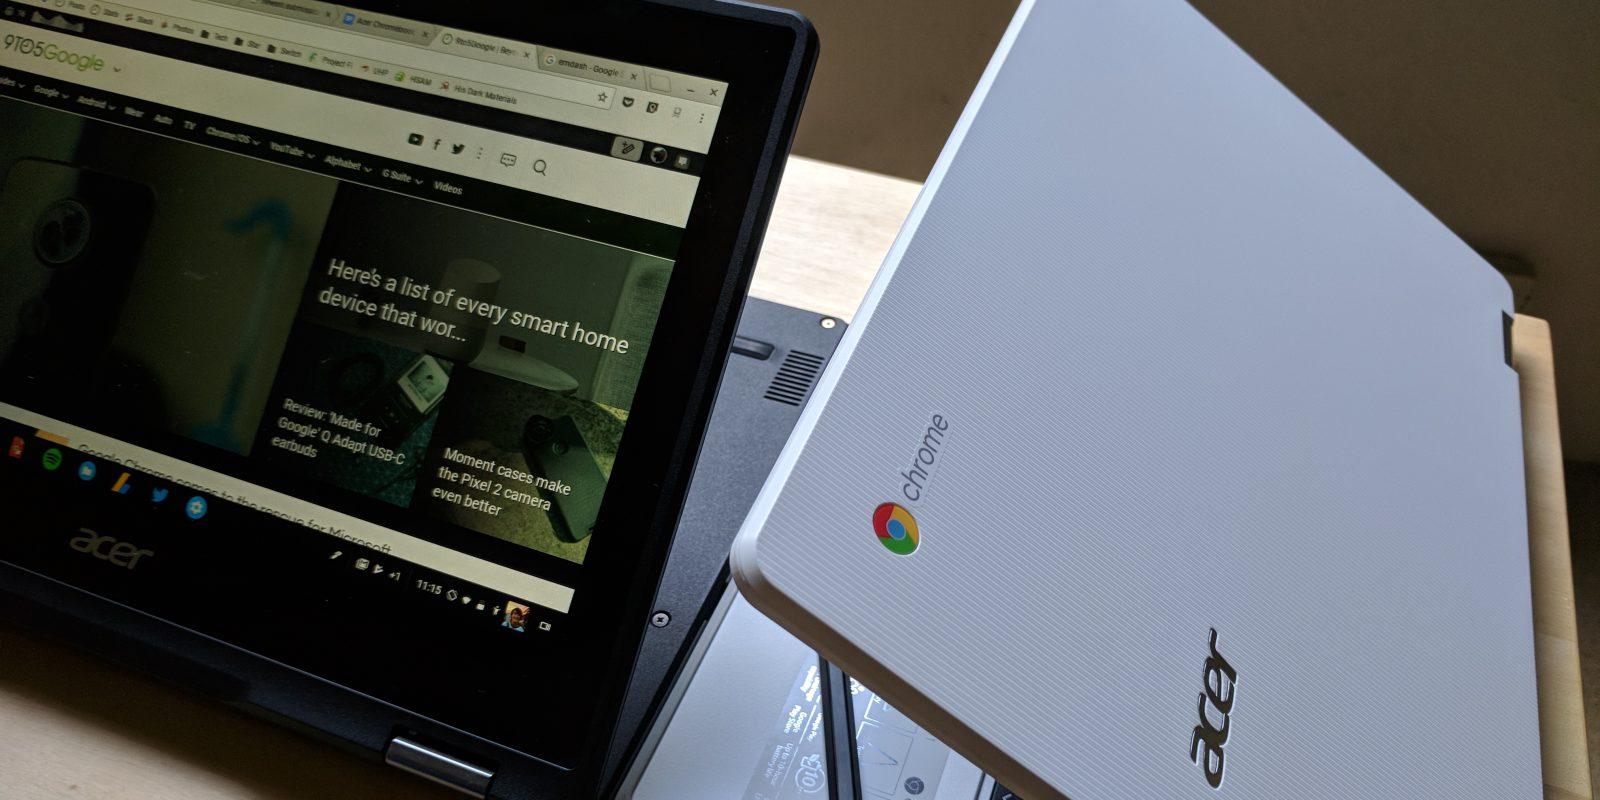 Portatile Chromebook Acer 13 pollici, funzionalità touch efficace ed avvio rapido